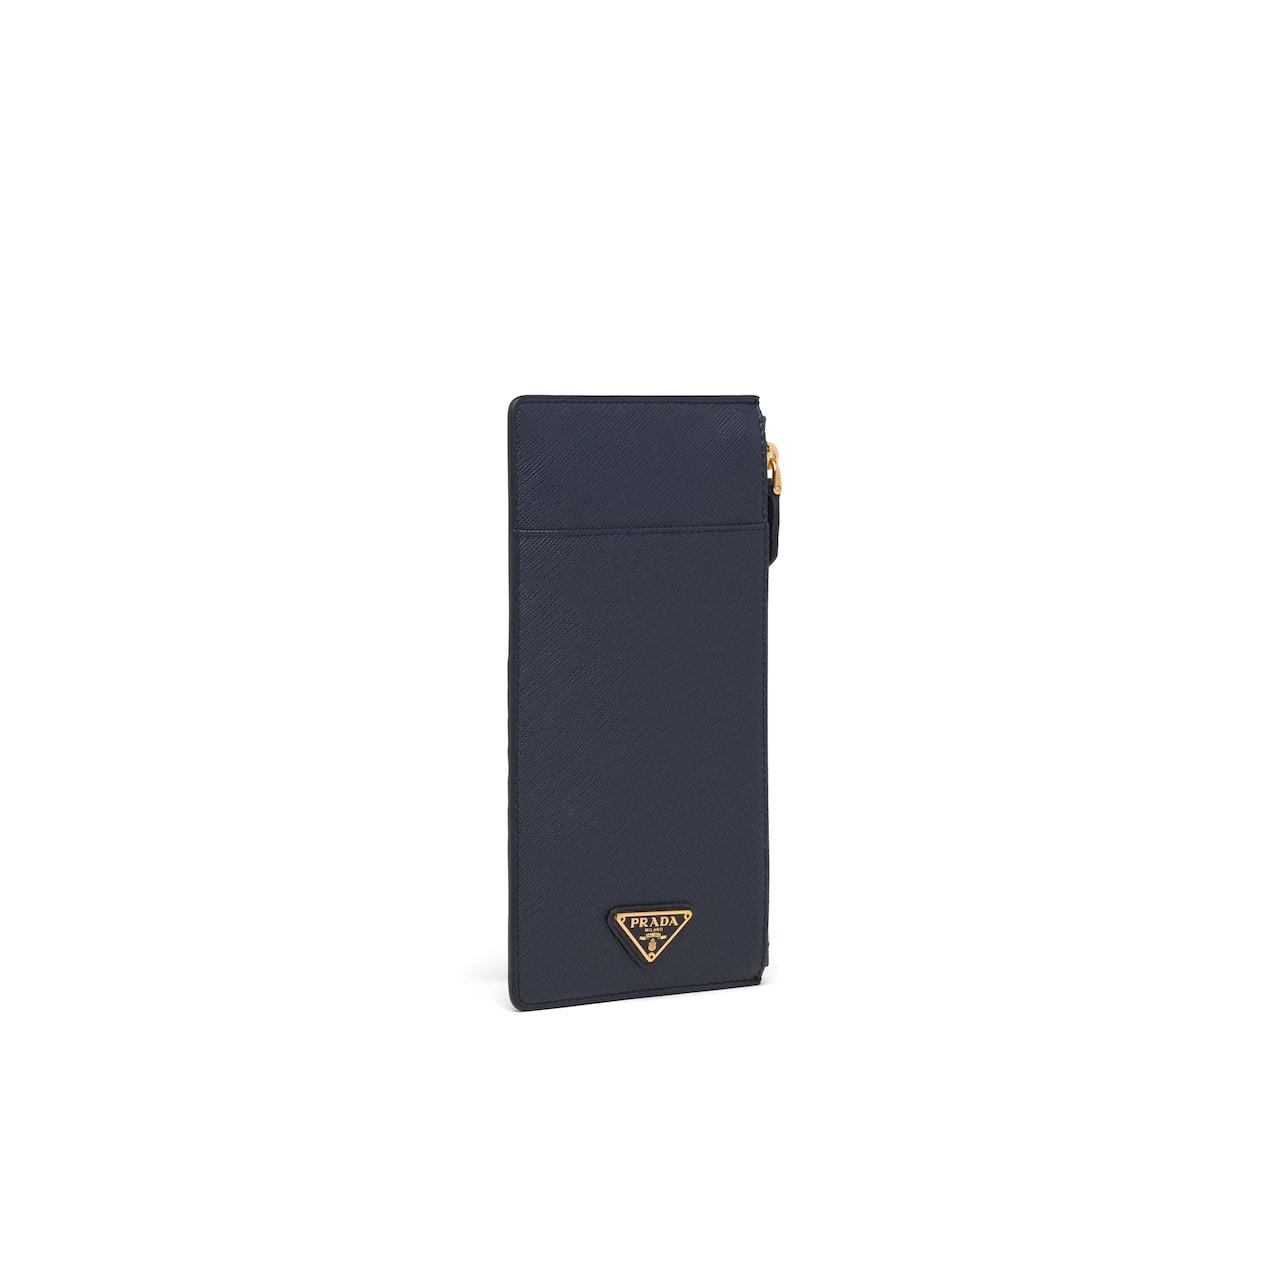 Prada Saffiano 皮革长钱夹 4